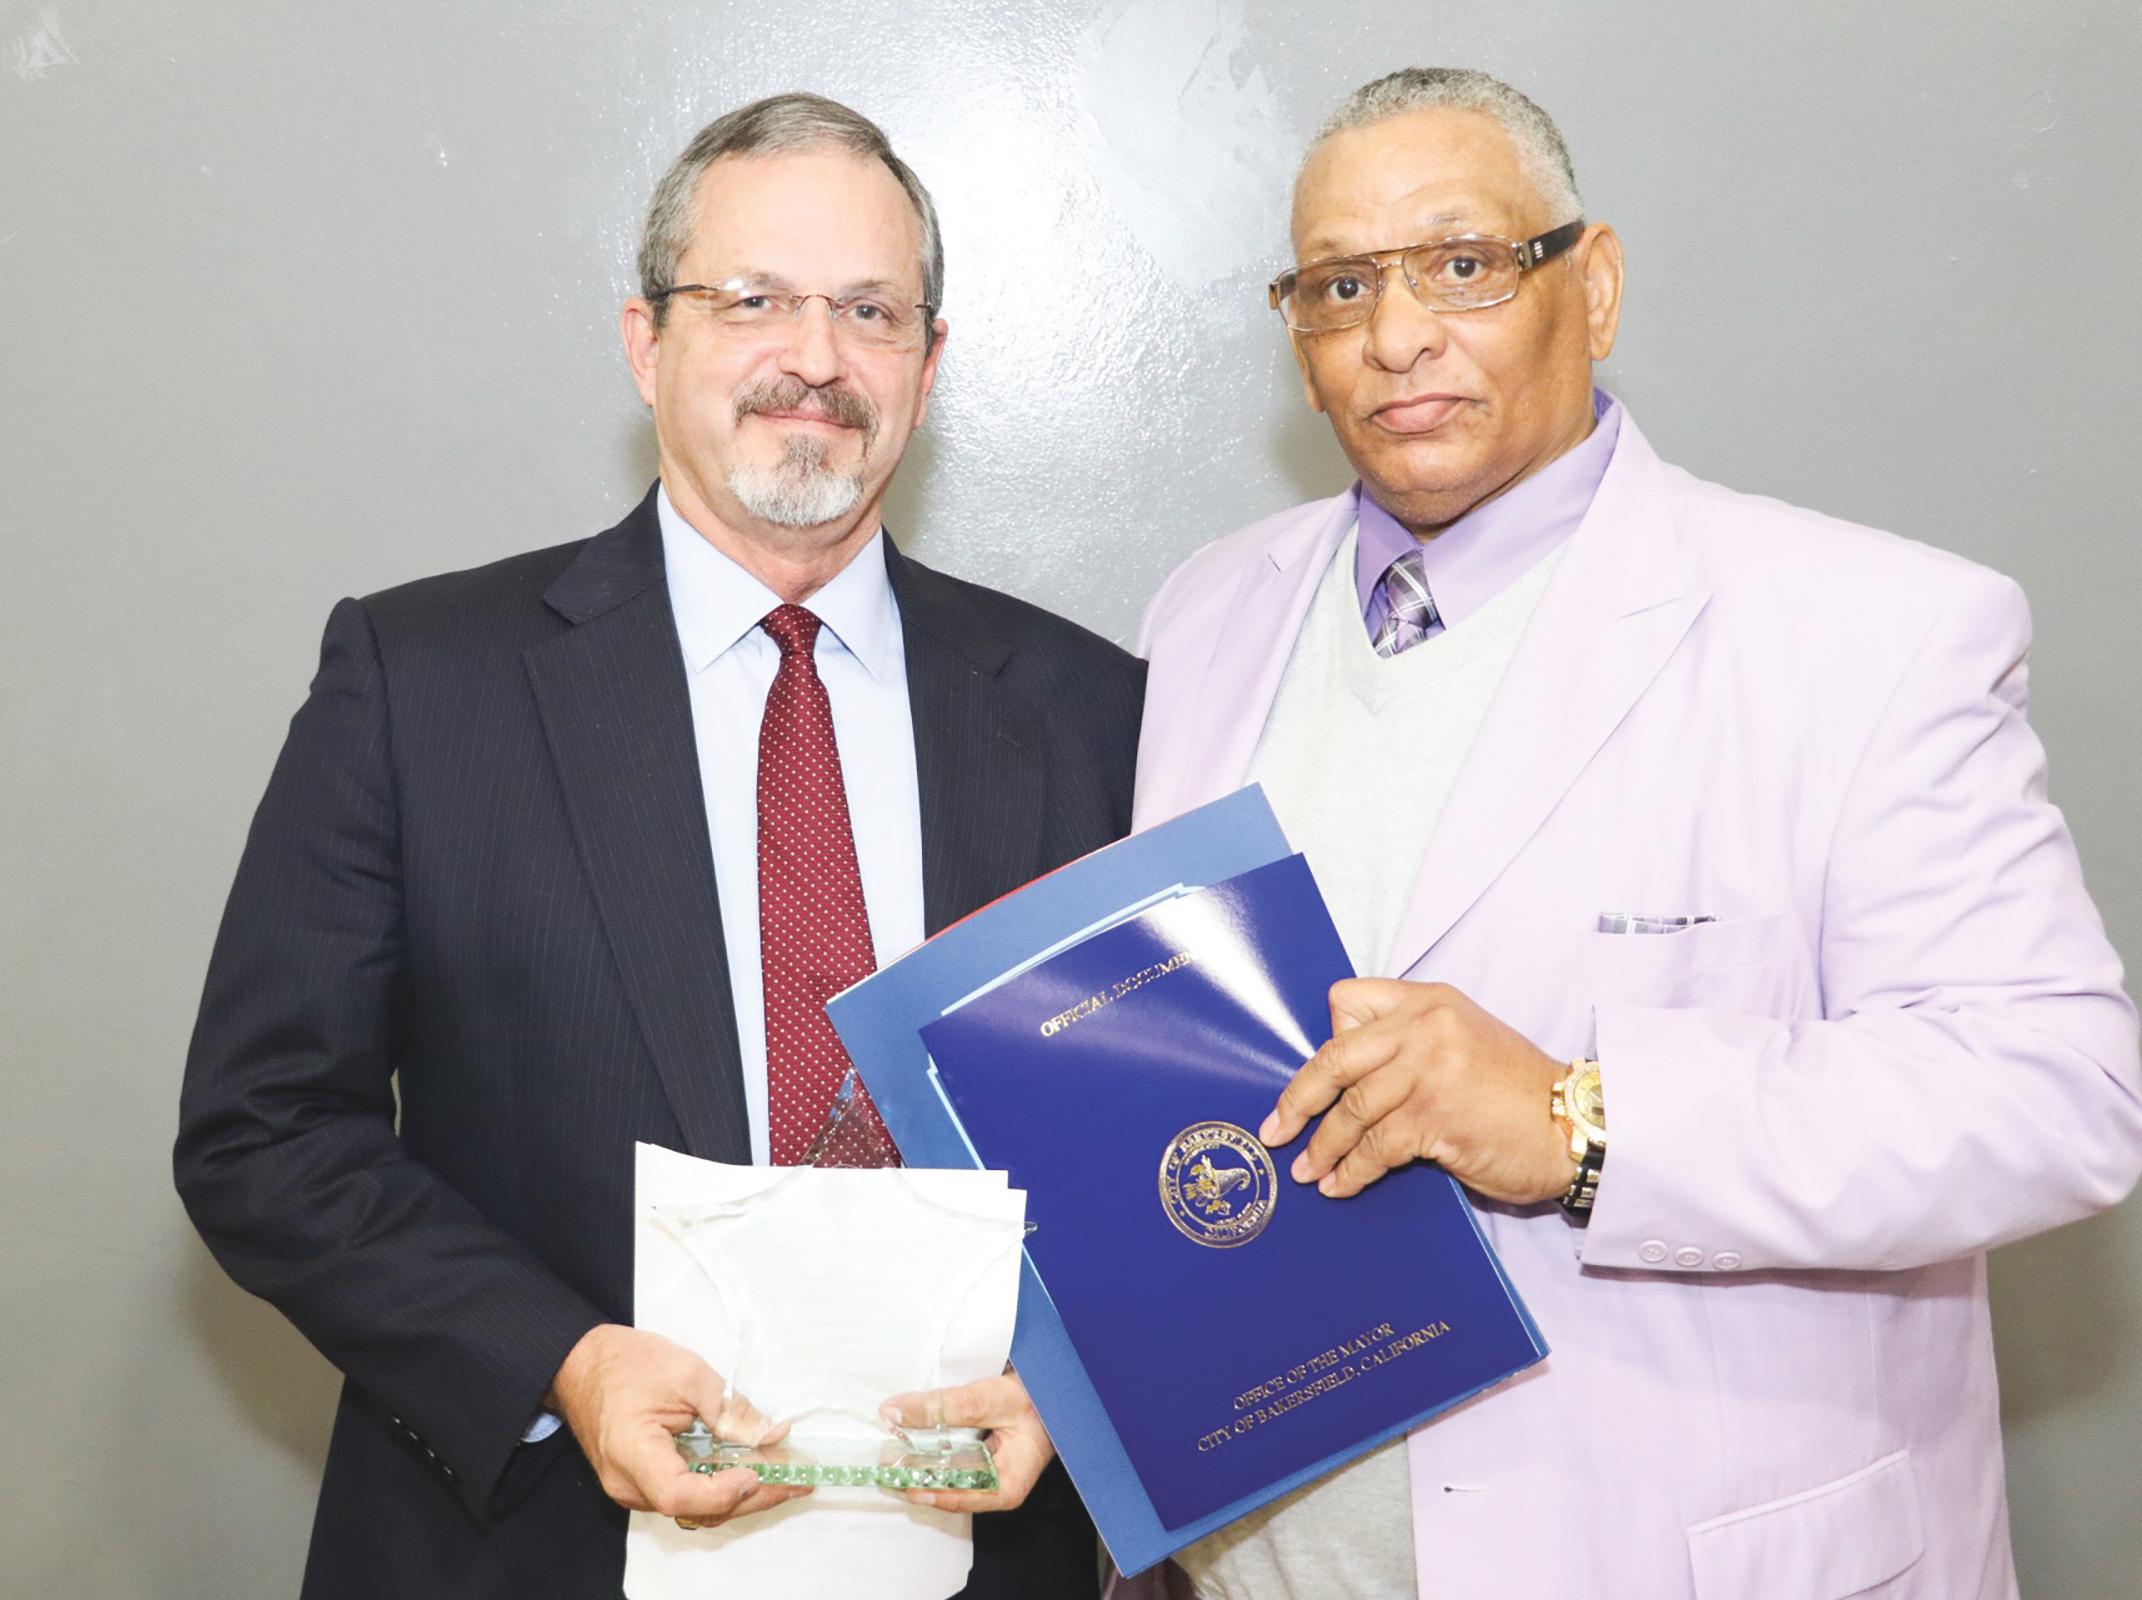 The Honorable Judge Stephen Schuett (L) accepting the Rev. Martin Luther King Jr. Mayor Harvey Hall Visionaries Award. (Carrington Prichett photo)